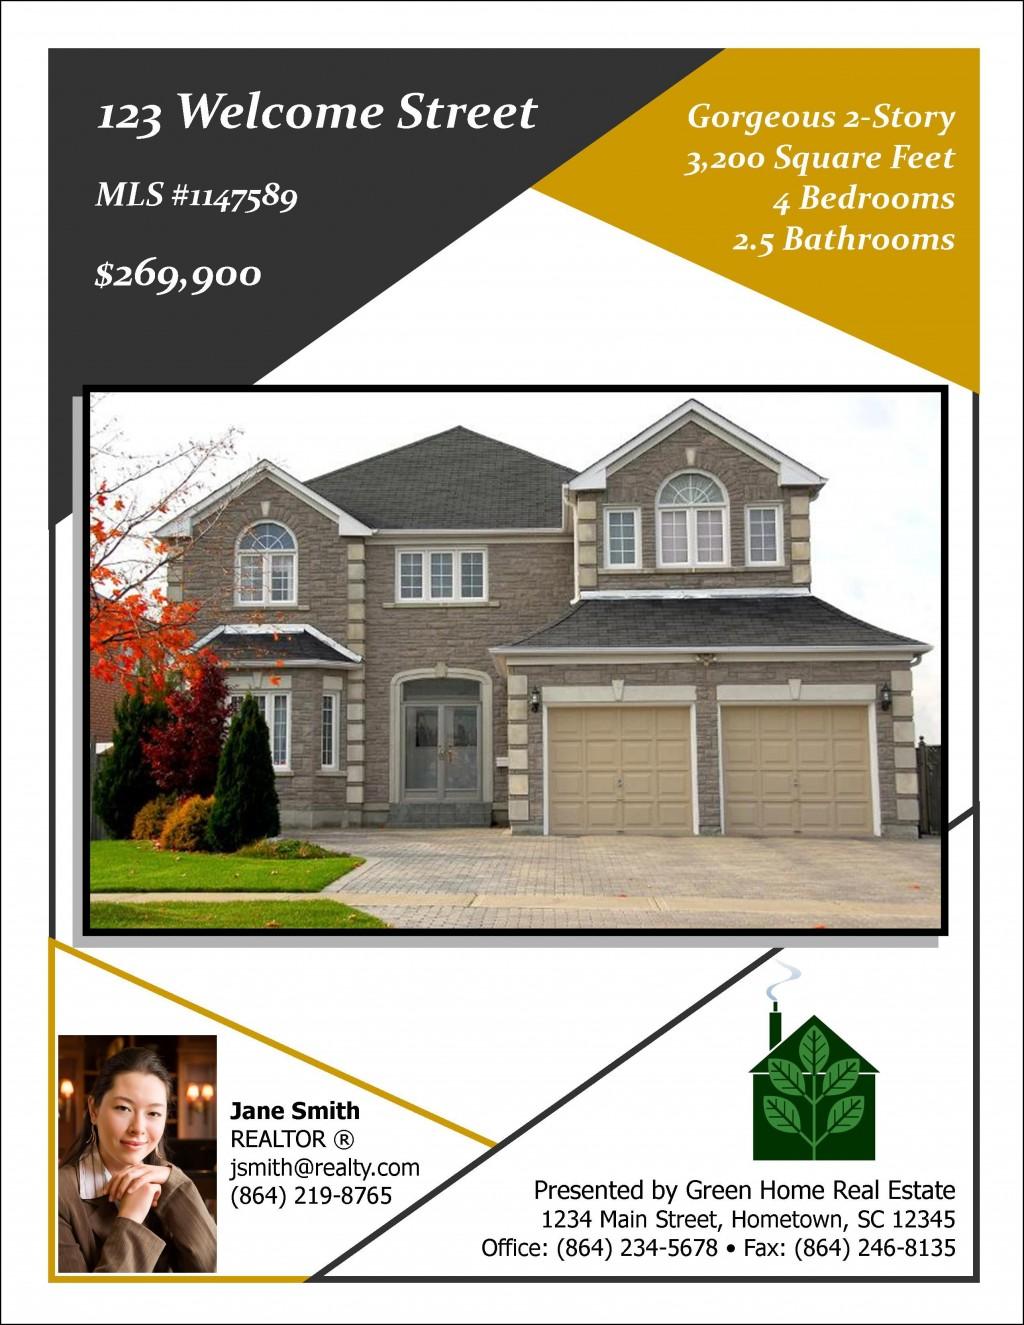 008 Awful Open House Flyer Template Free Photo  School Microsoft Word PreschoolLarge